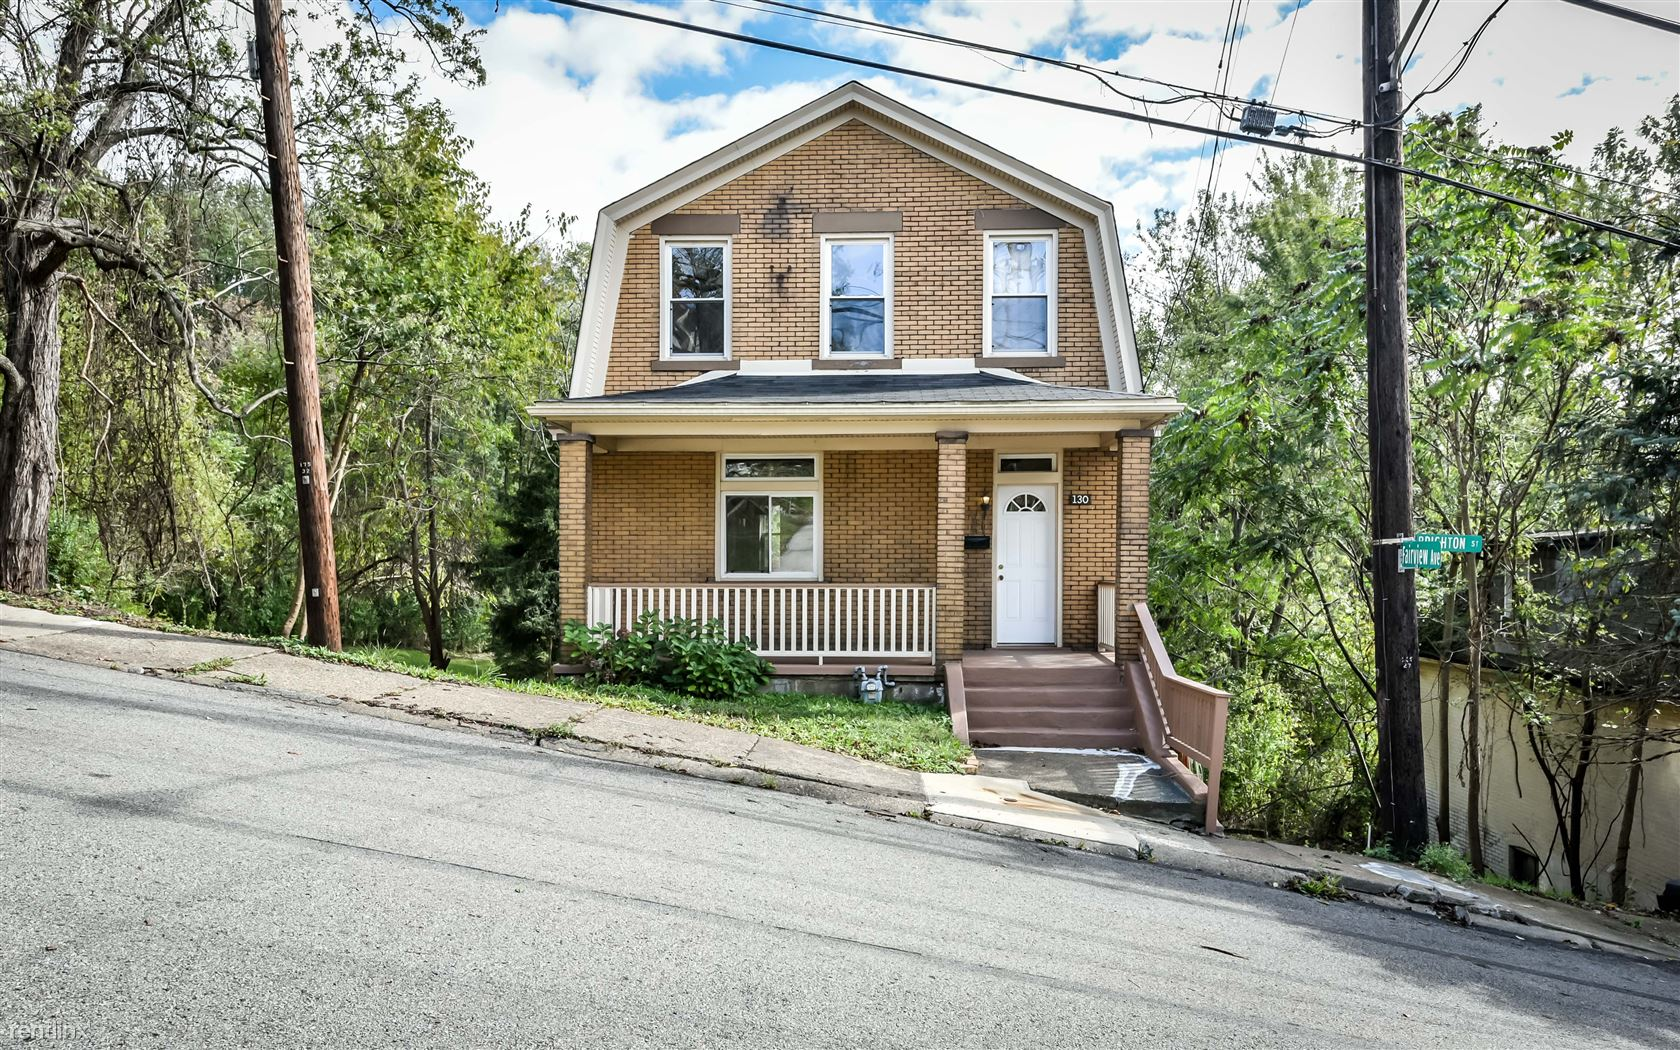 130 Brighton St, East Pittsburgh, PA - $945